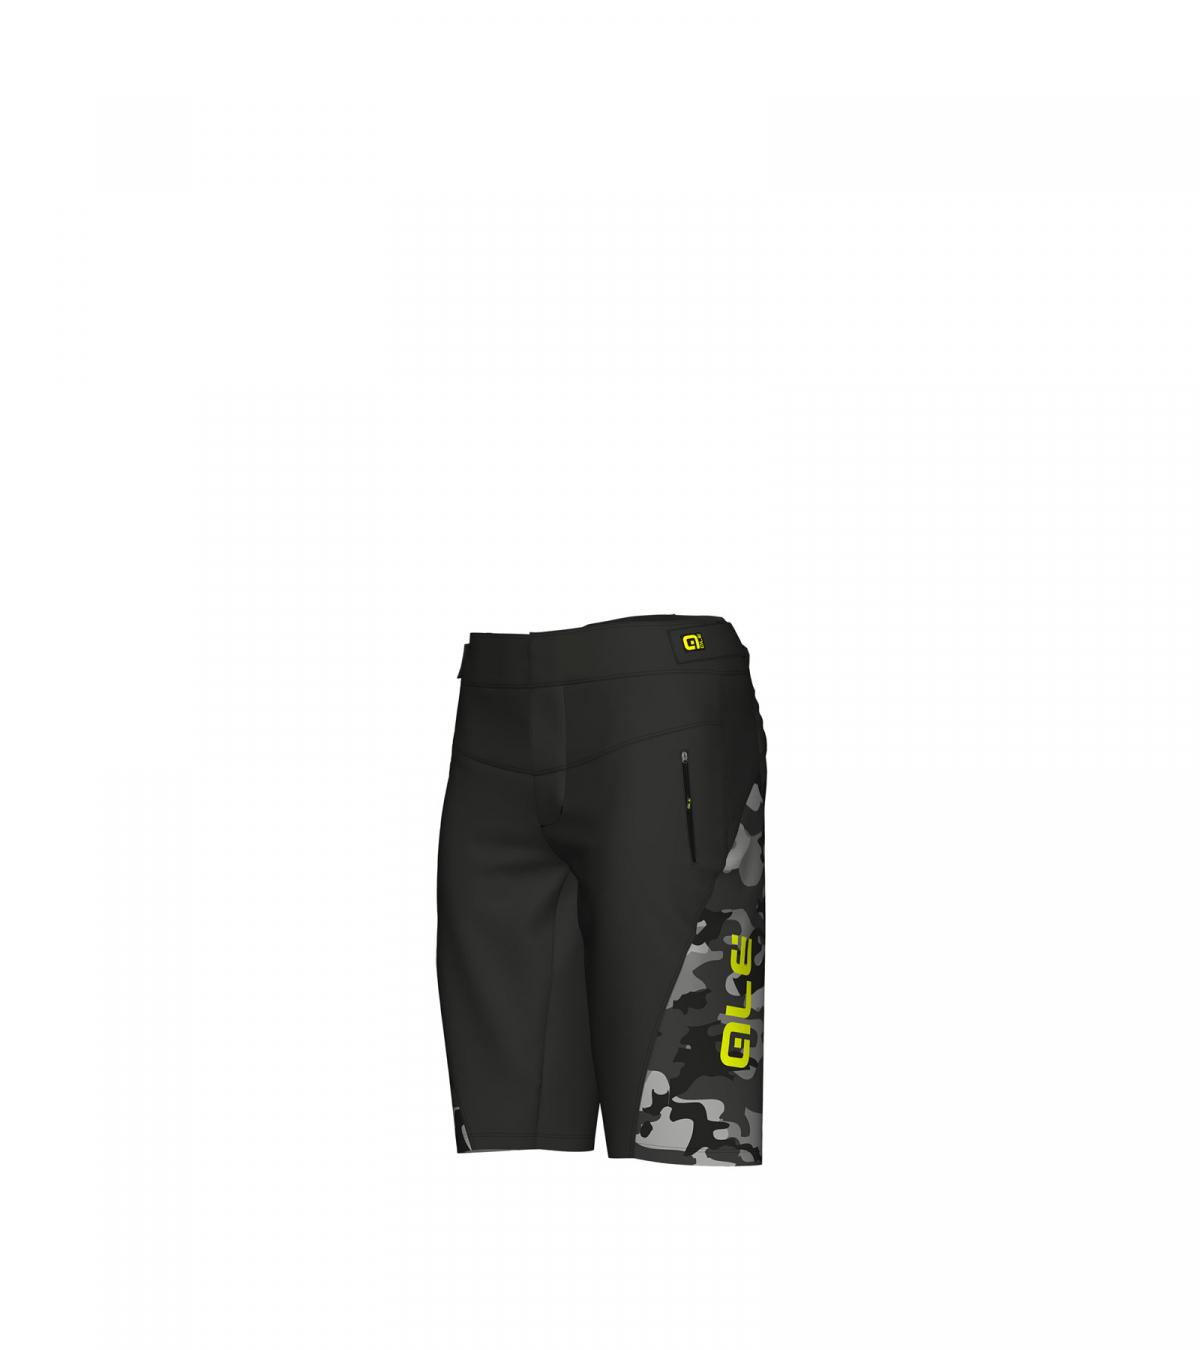 L12054017-camo-enduro-men-black-yellow-fluo-shorts-side-front_1200_1350